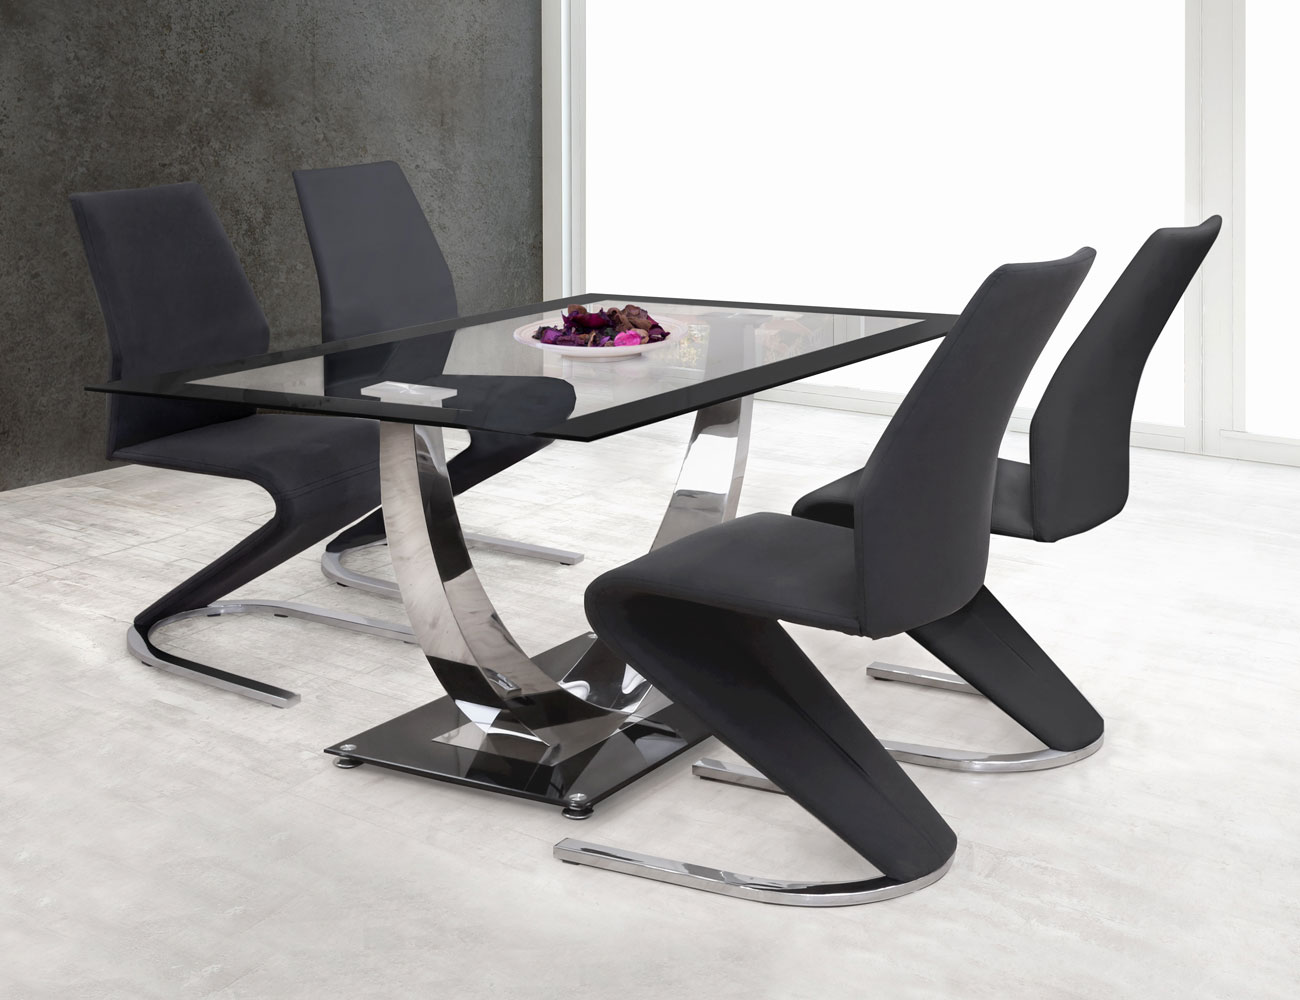 Mesa de comedor de cristal templado decorativa factory - Mesa cocina cristal templado ...